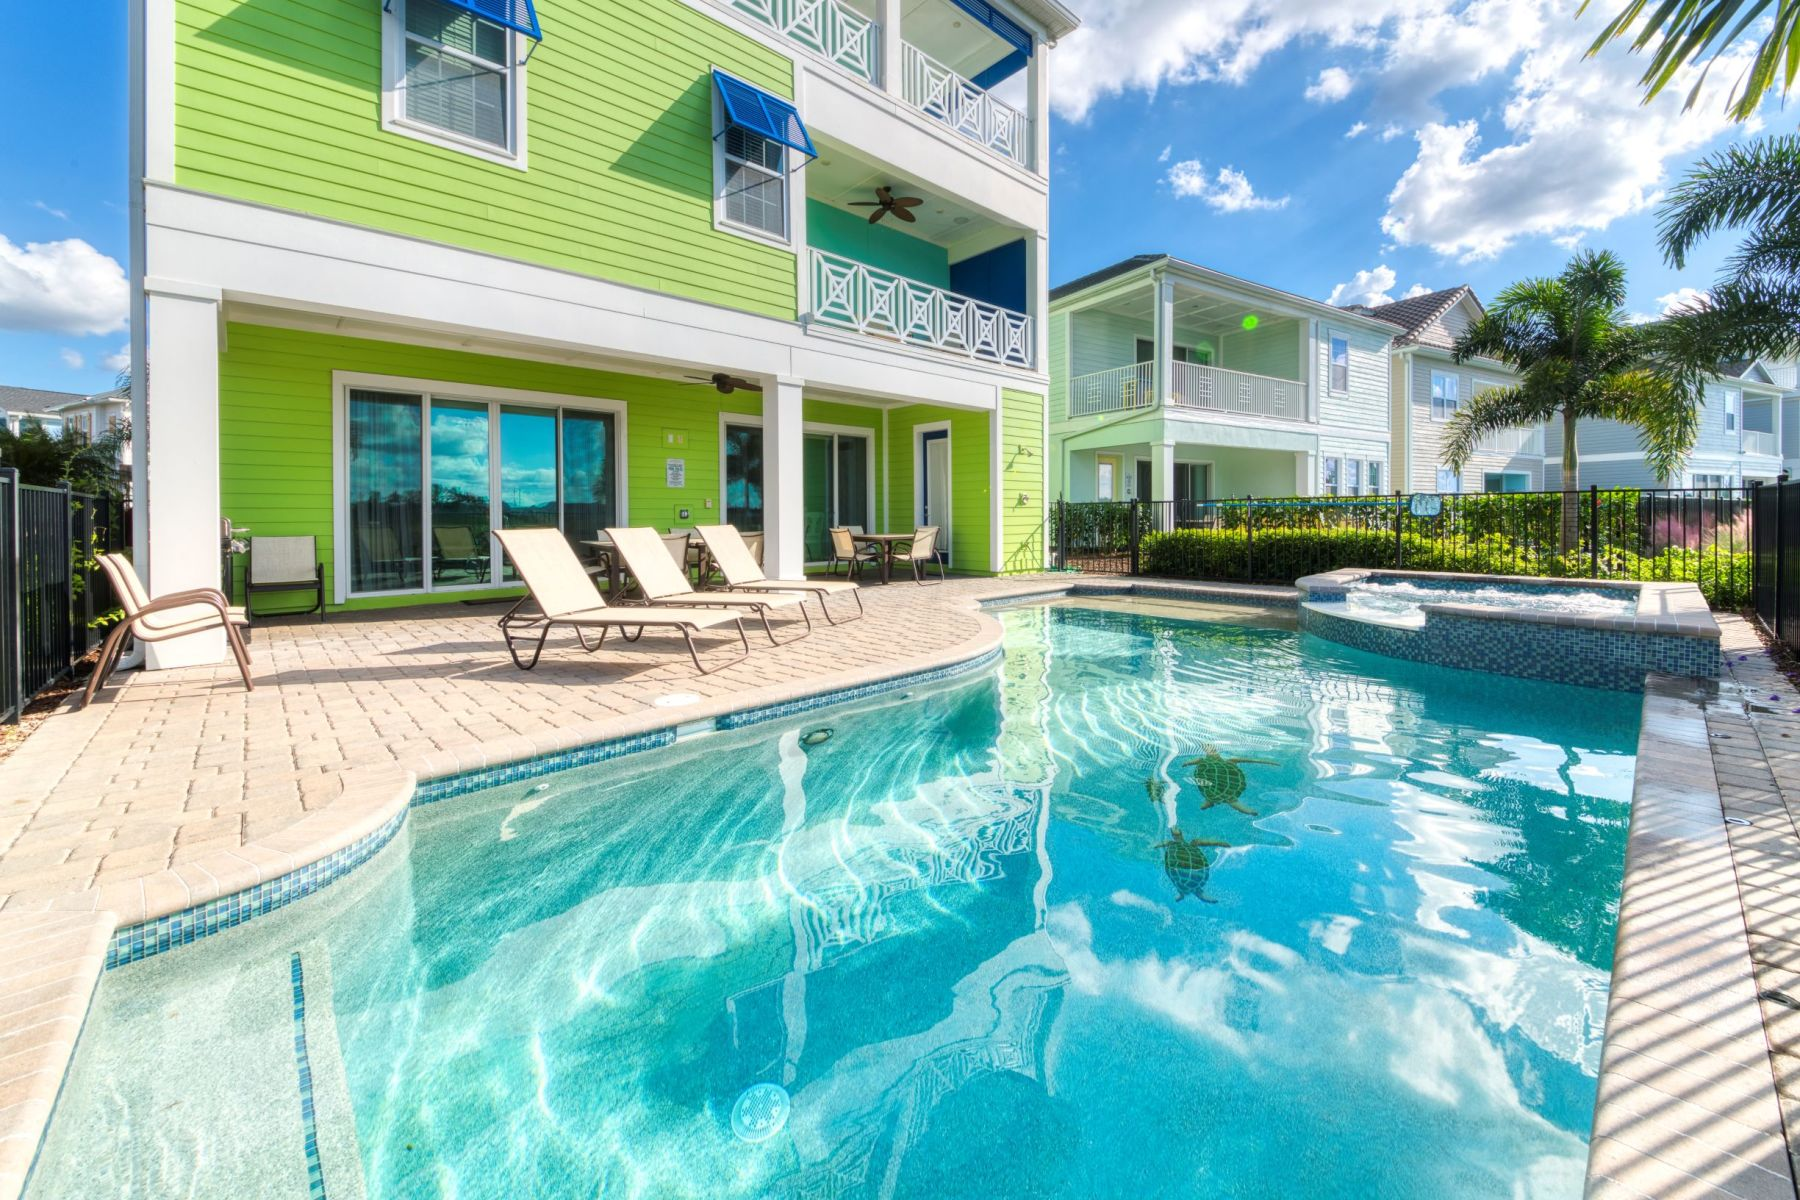 Margaritaville Resort Orlando Cottages by Rentyl ...